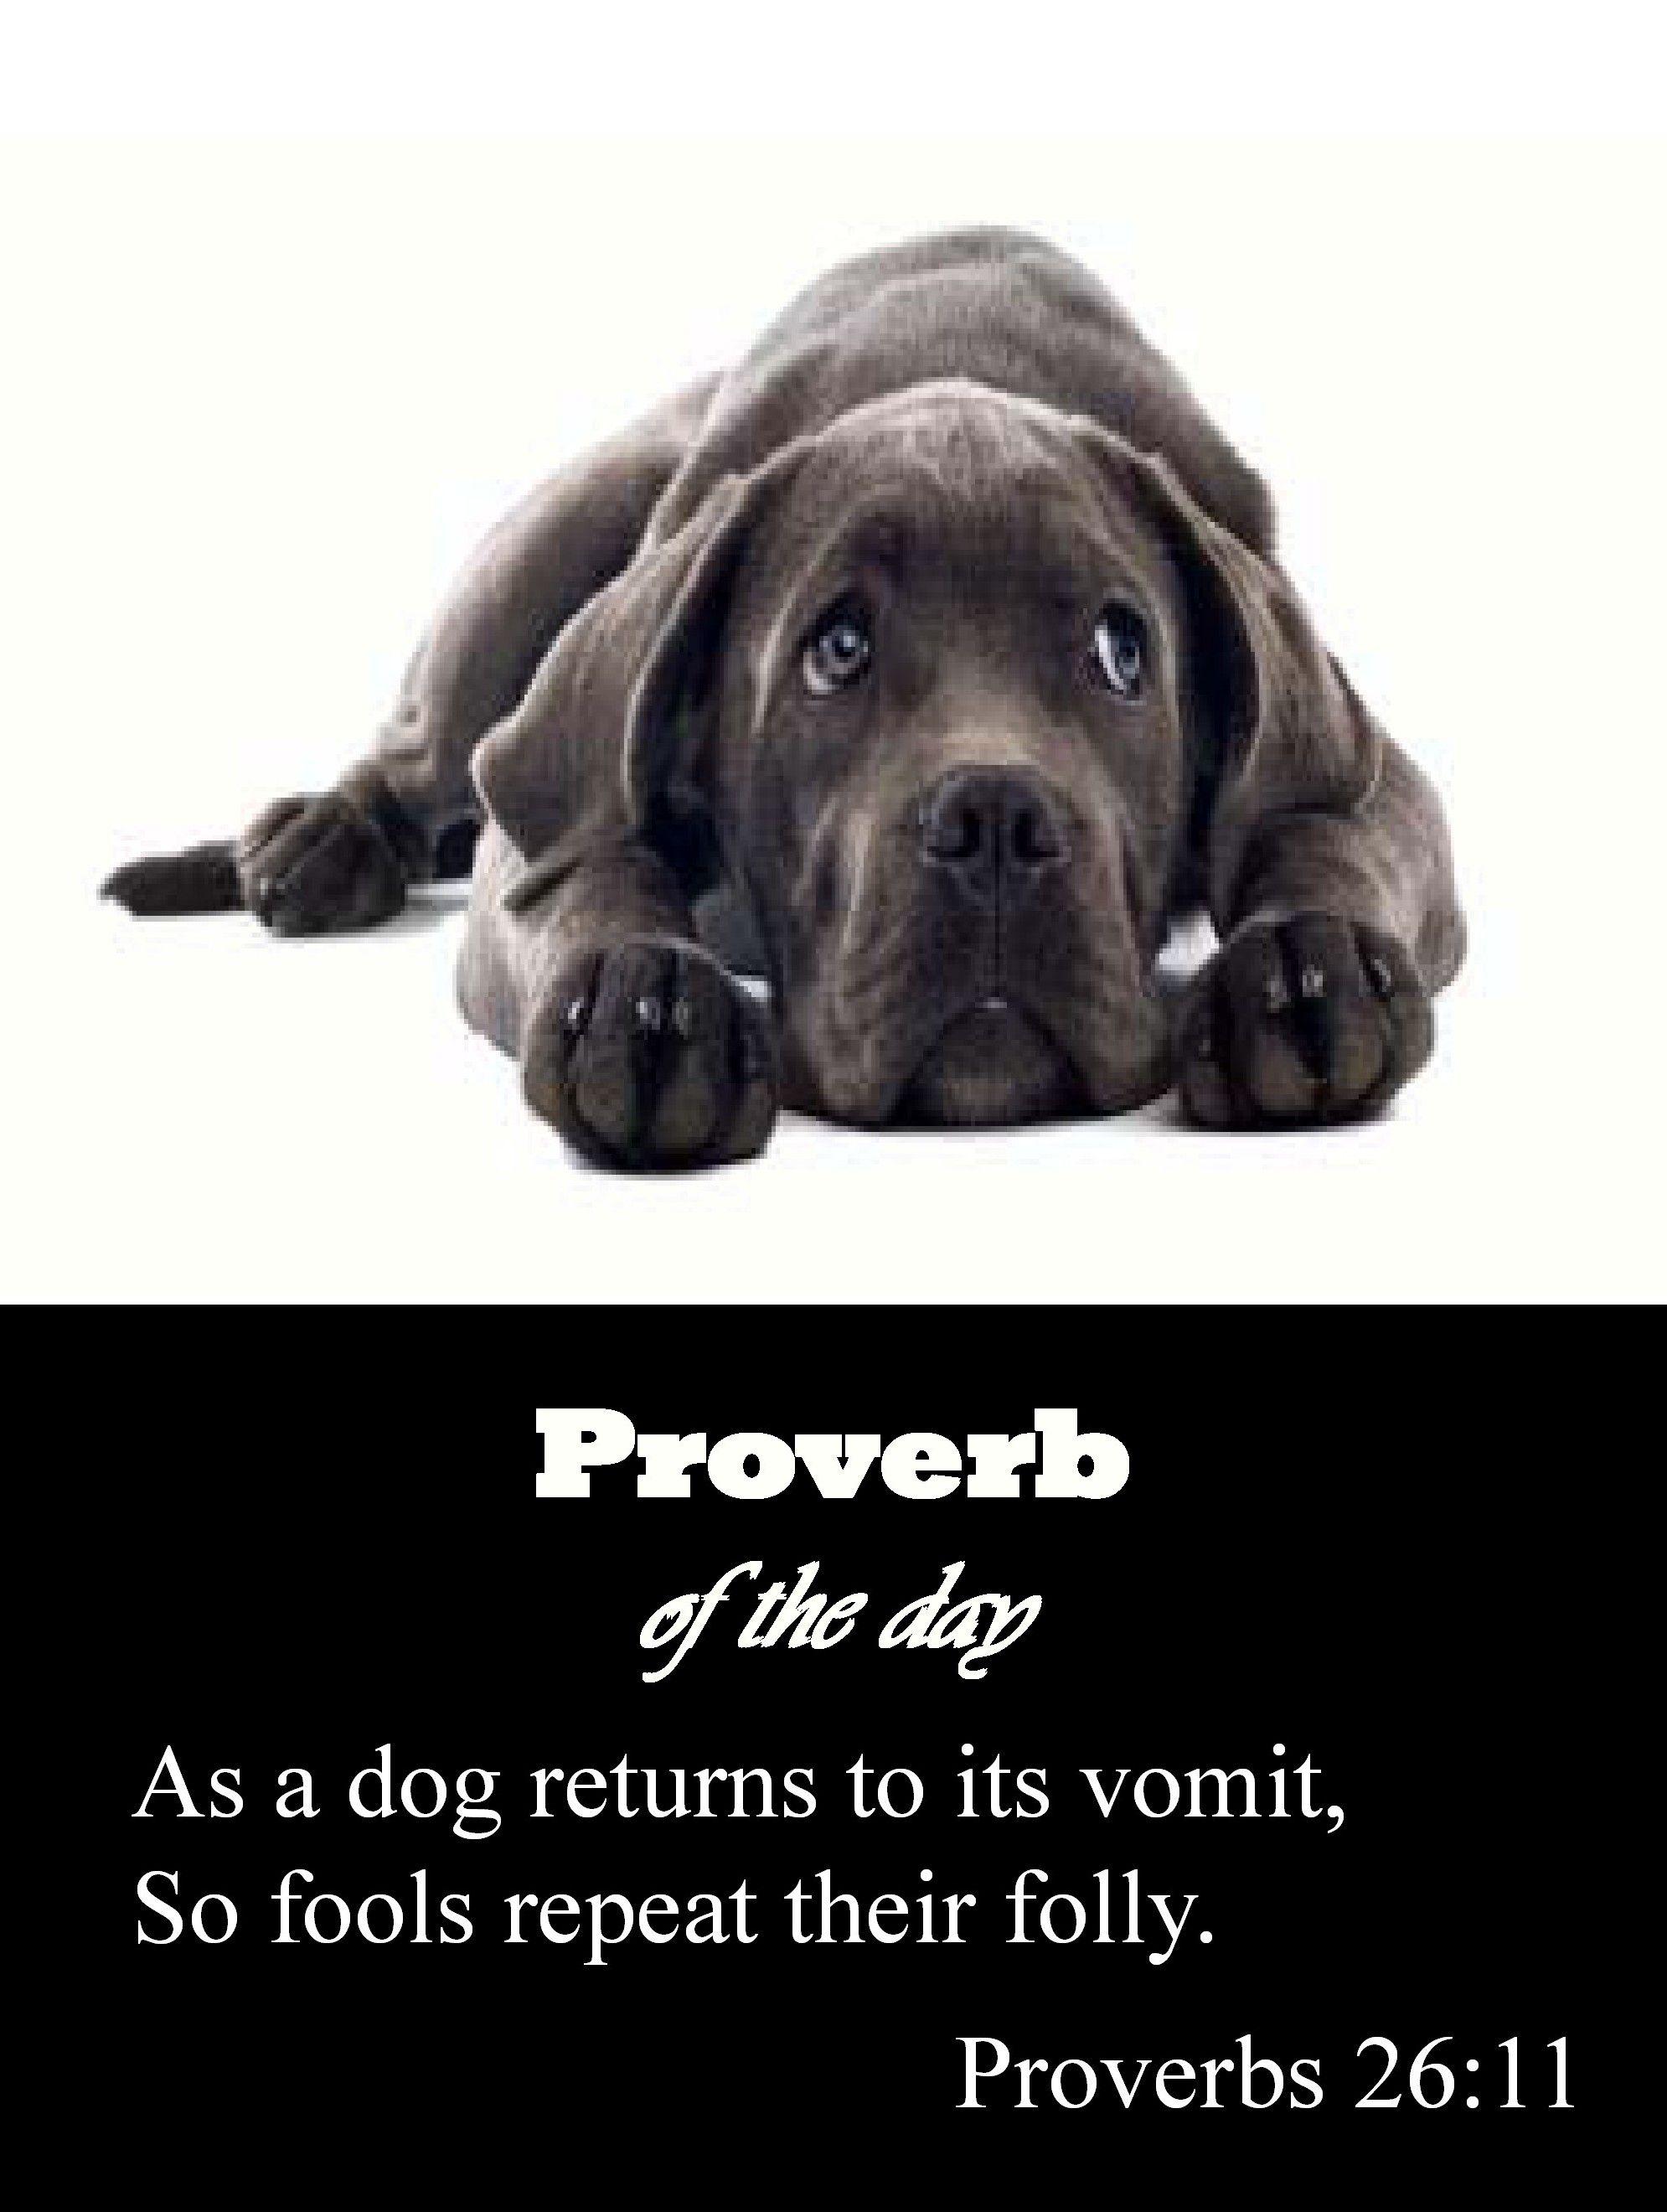 Proverbs 26:11 | Bible proverbs, Book of proverbs, Scripture verses